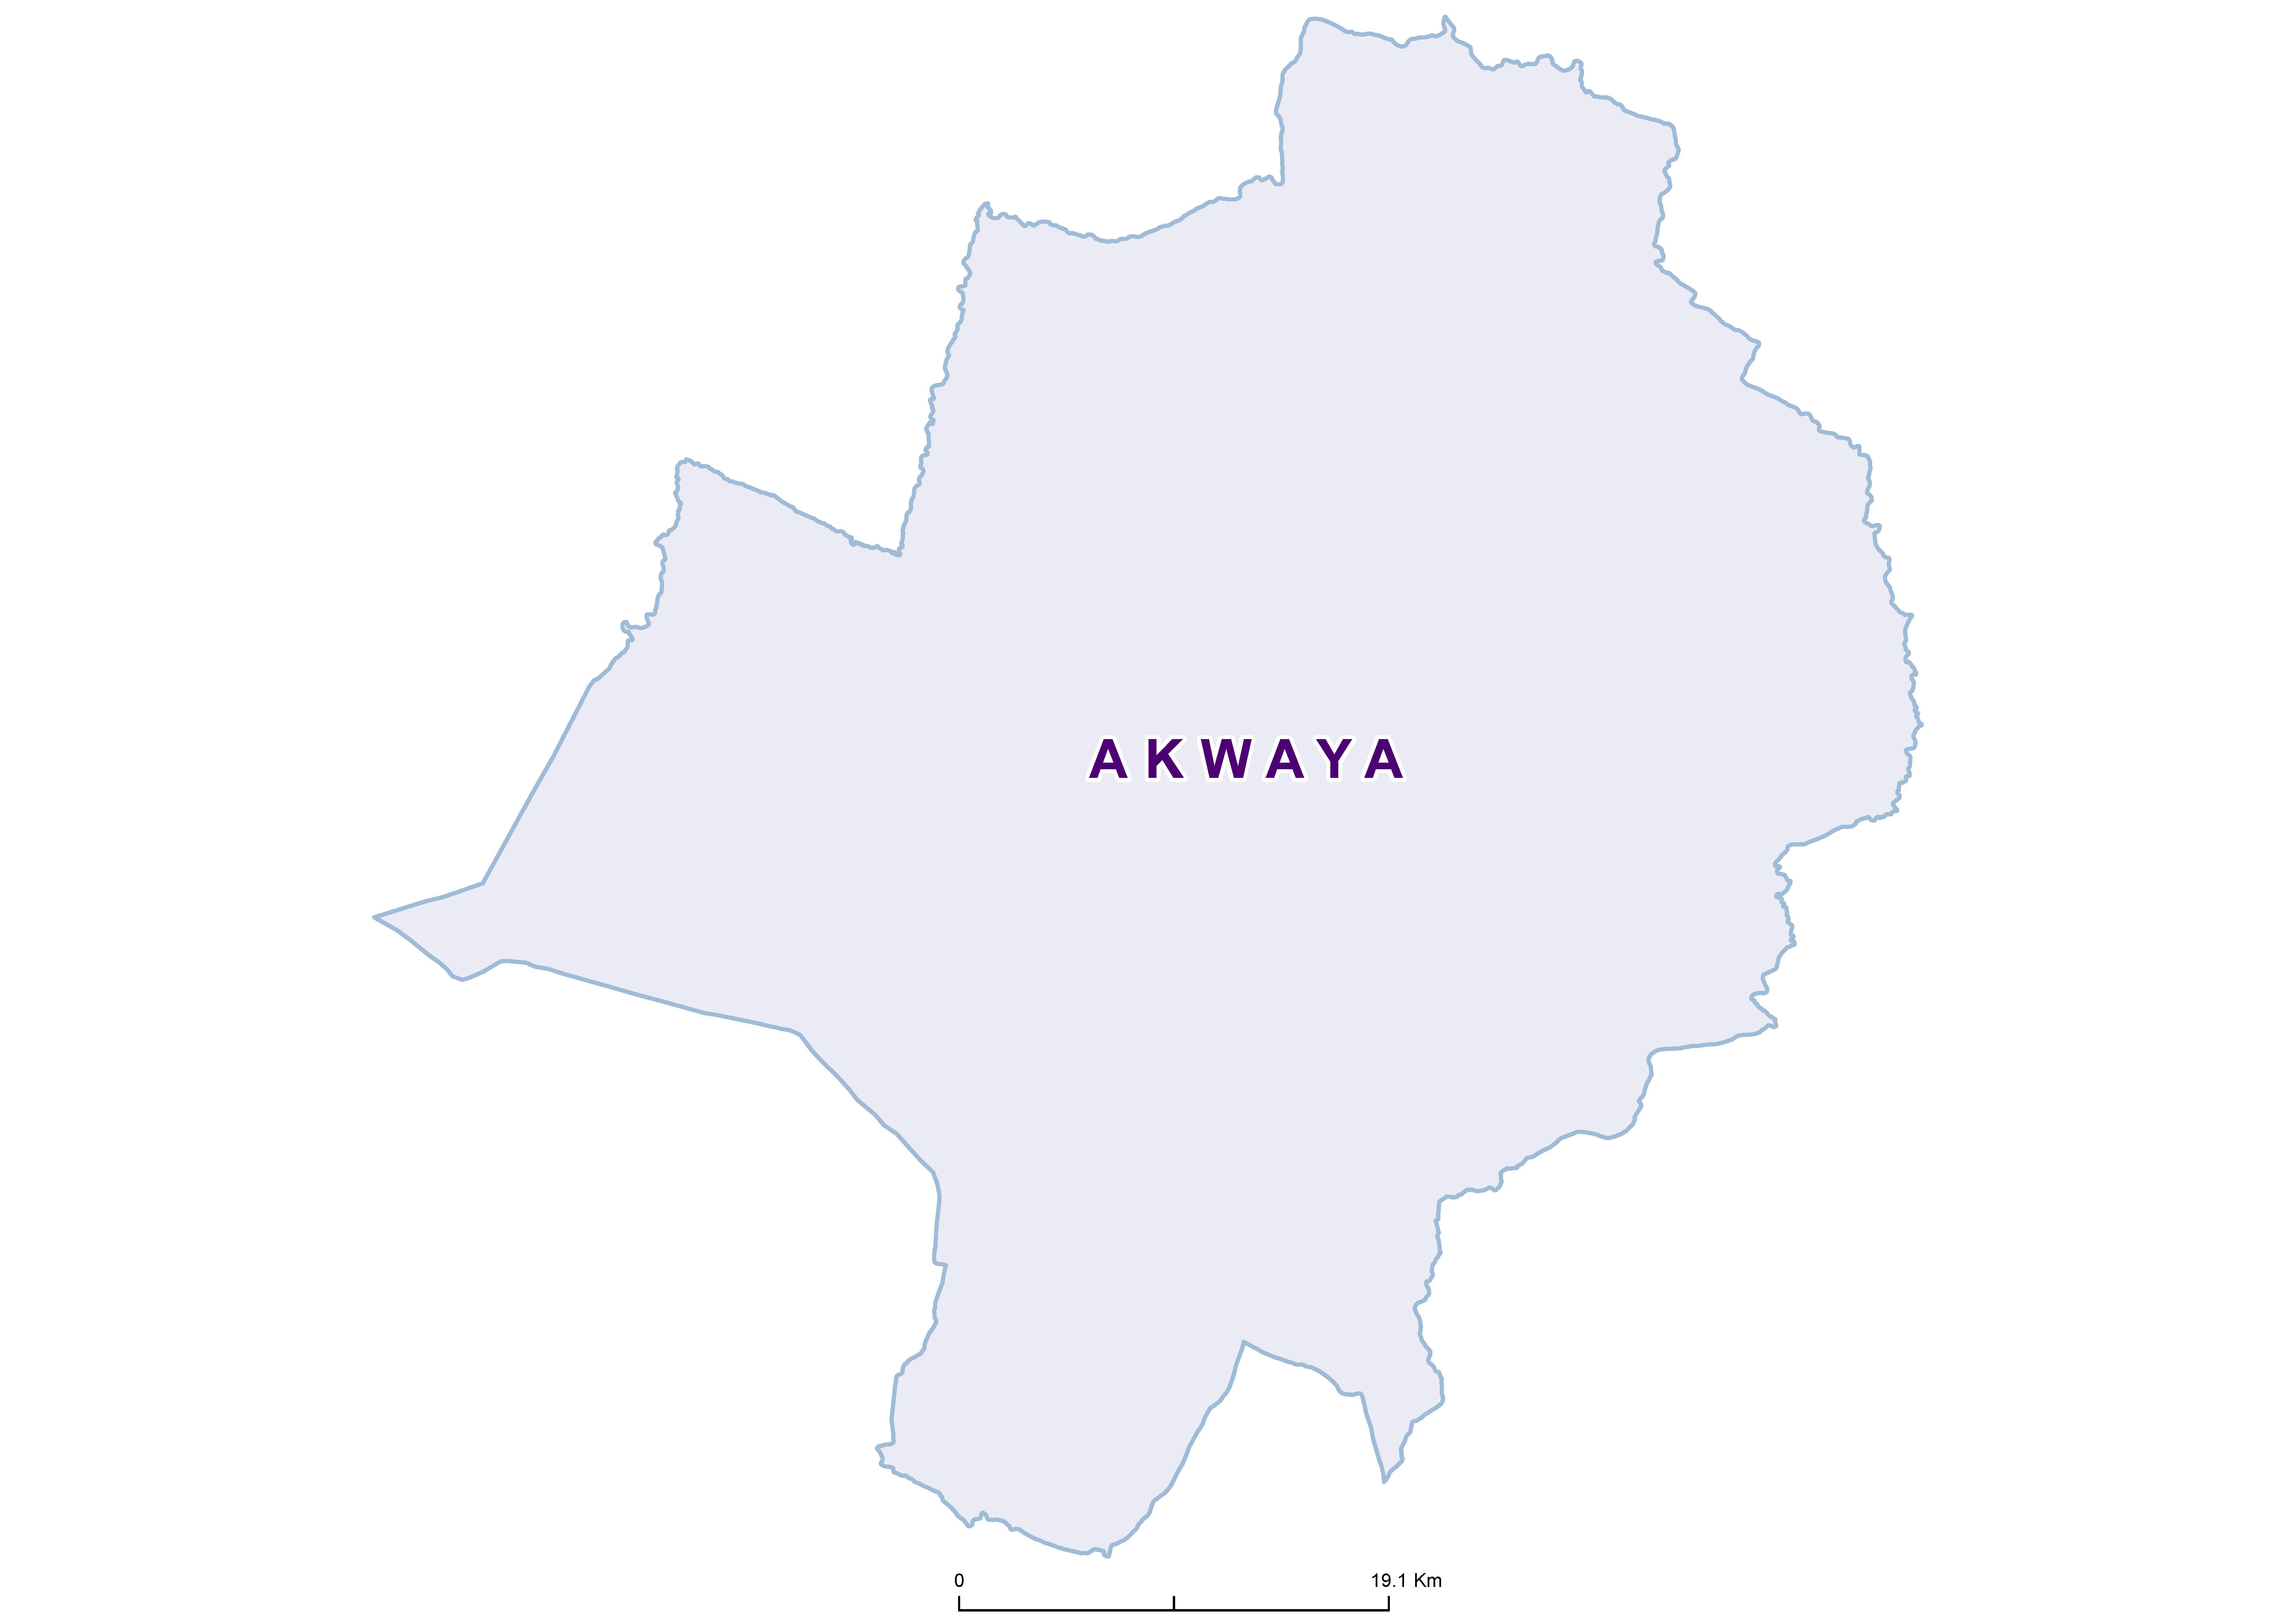 Akwaya Mean SCH 19850001